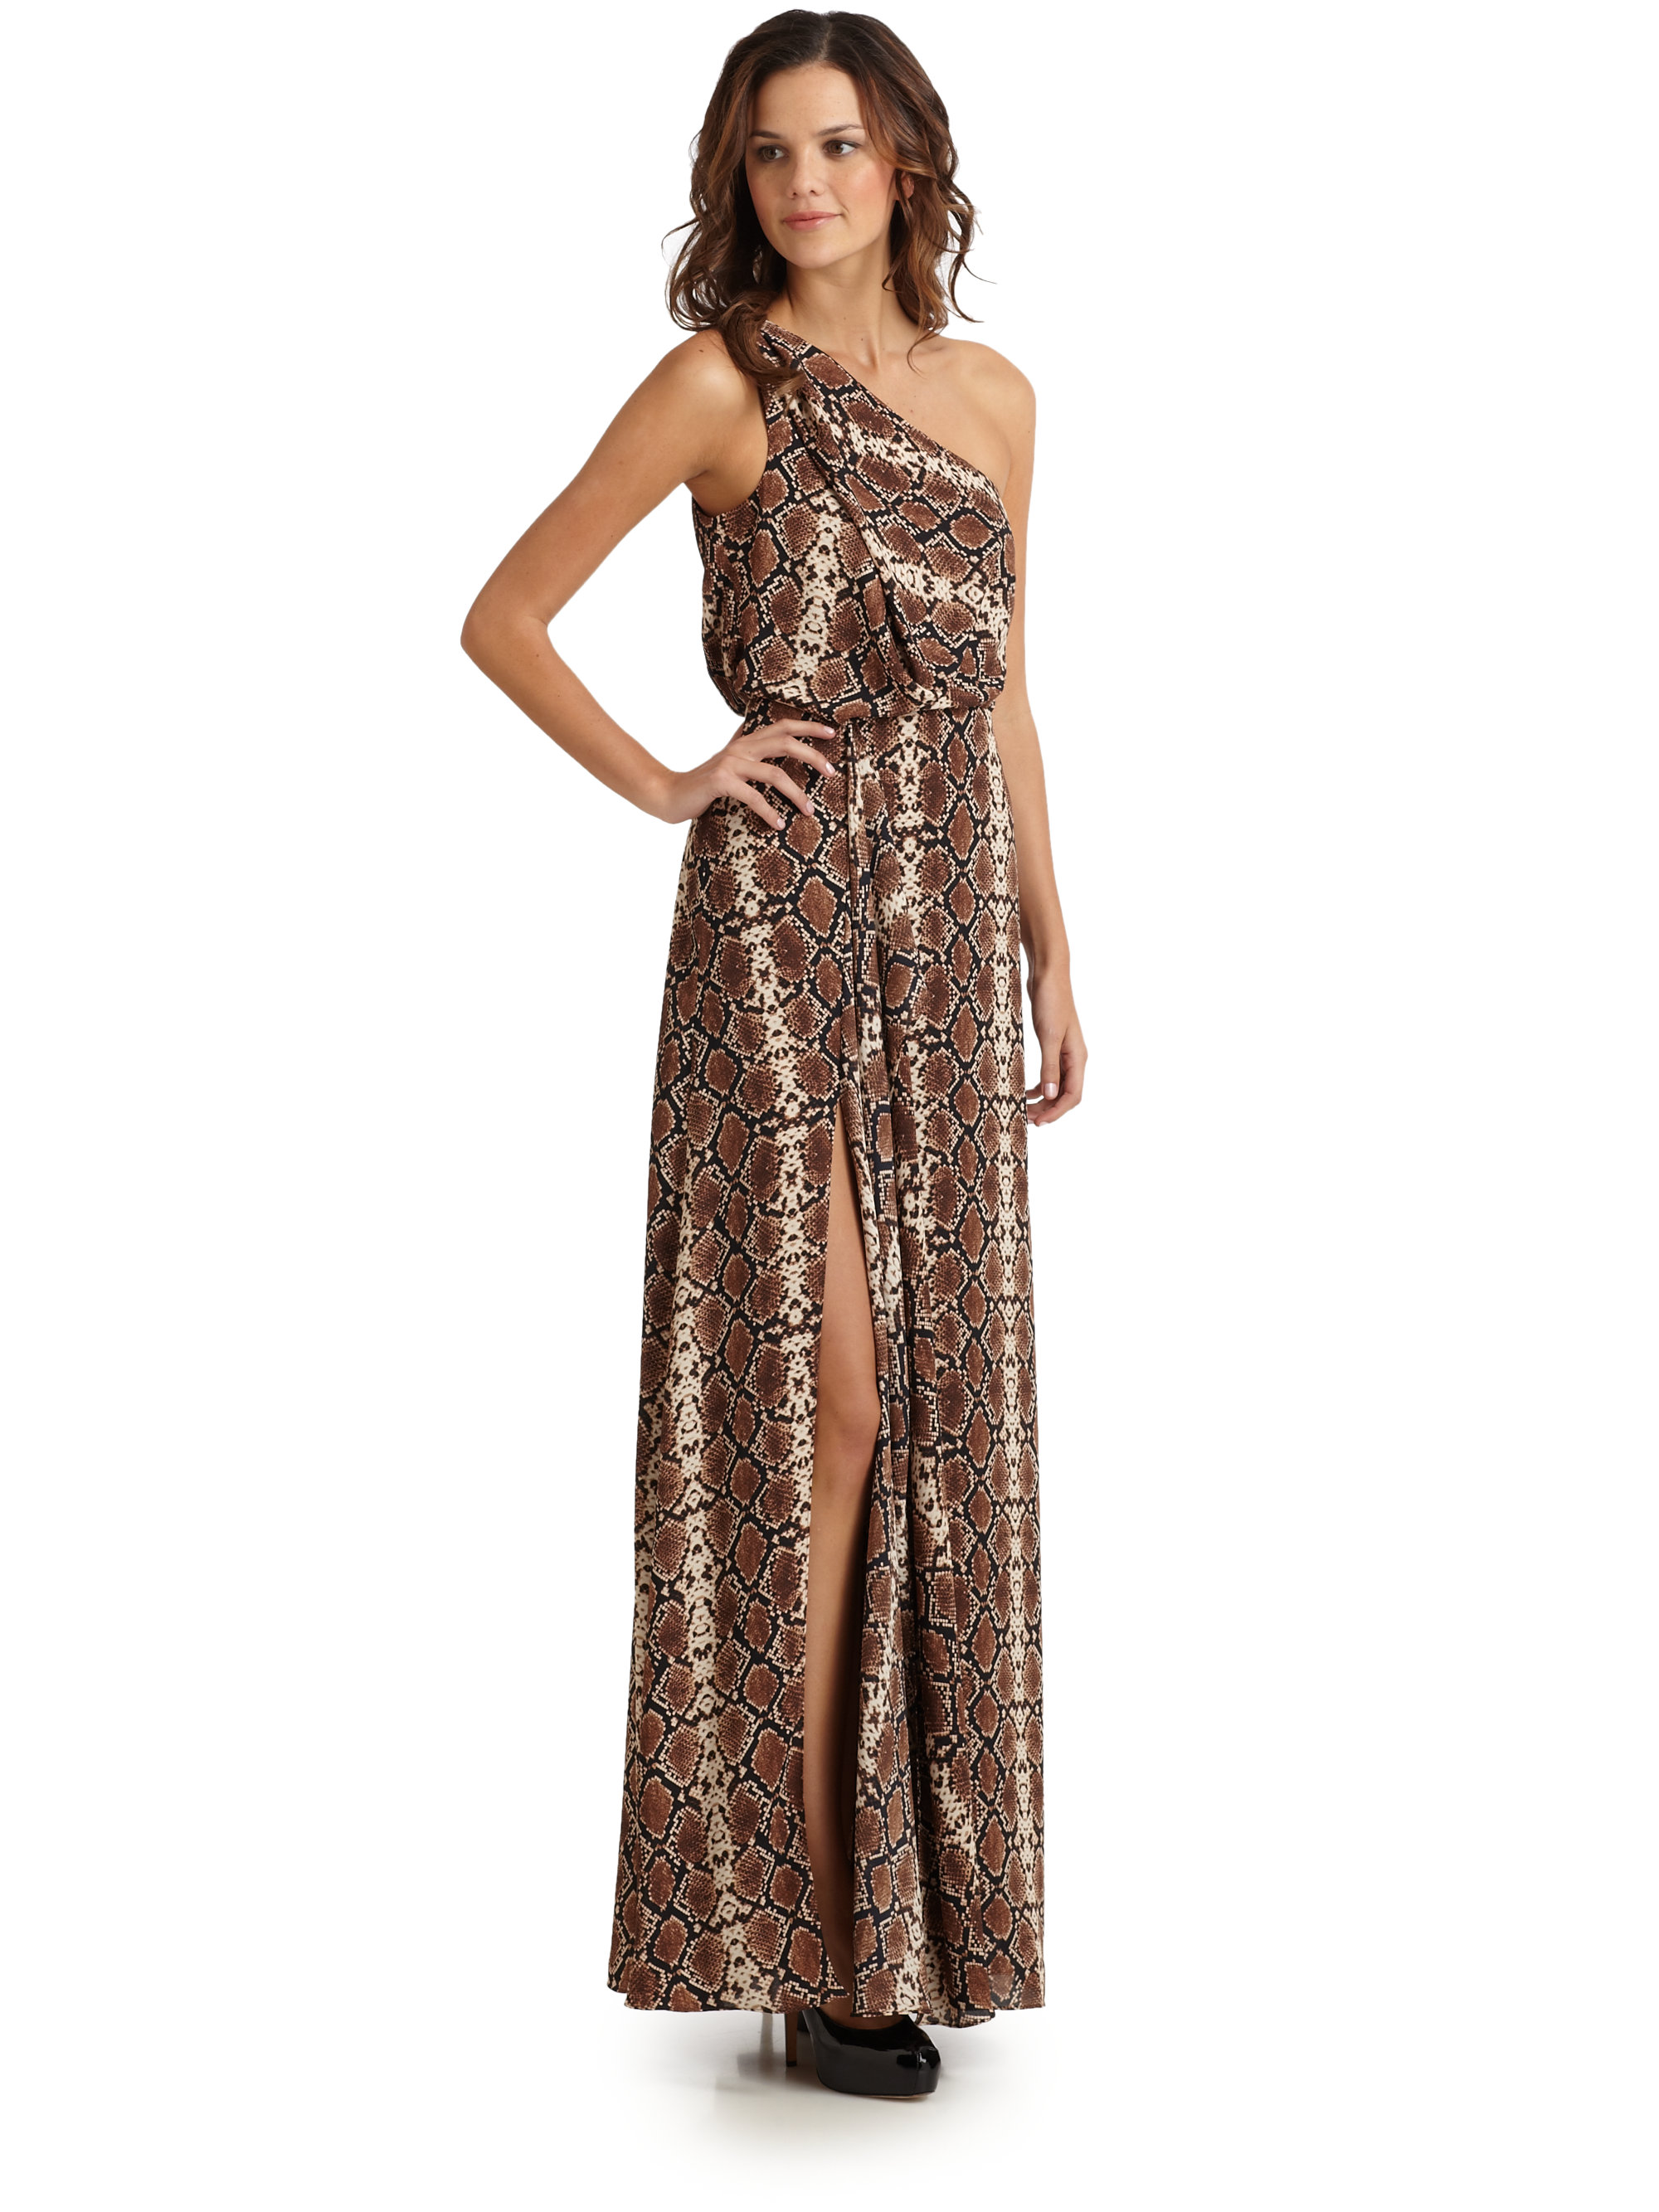 aafb24f17365 BCBGMAXAZRIA Kessa Reptile Print One-Shoulder Dress - Lyst